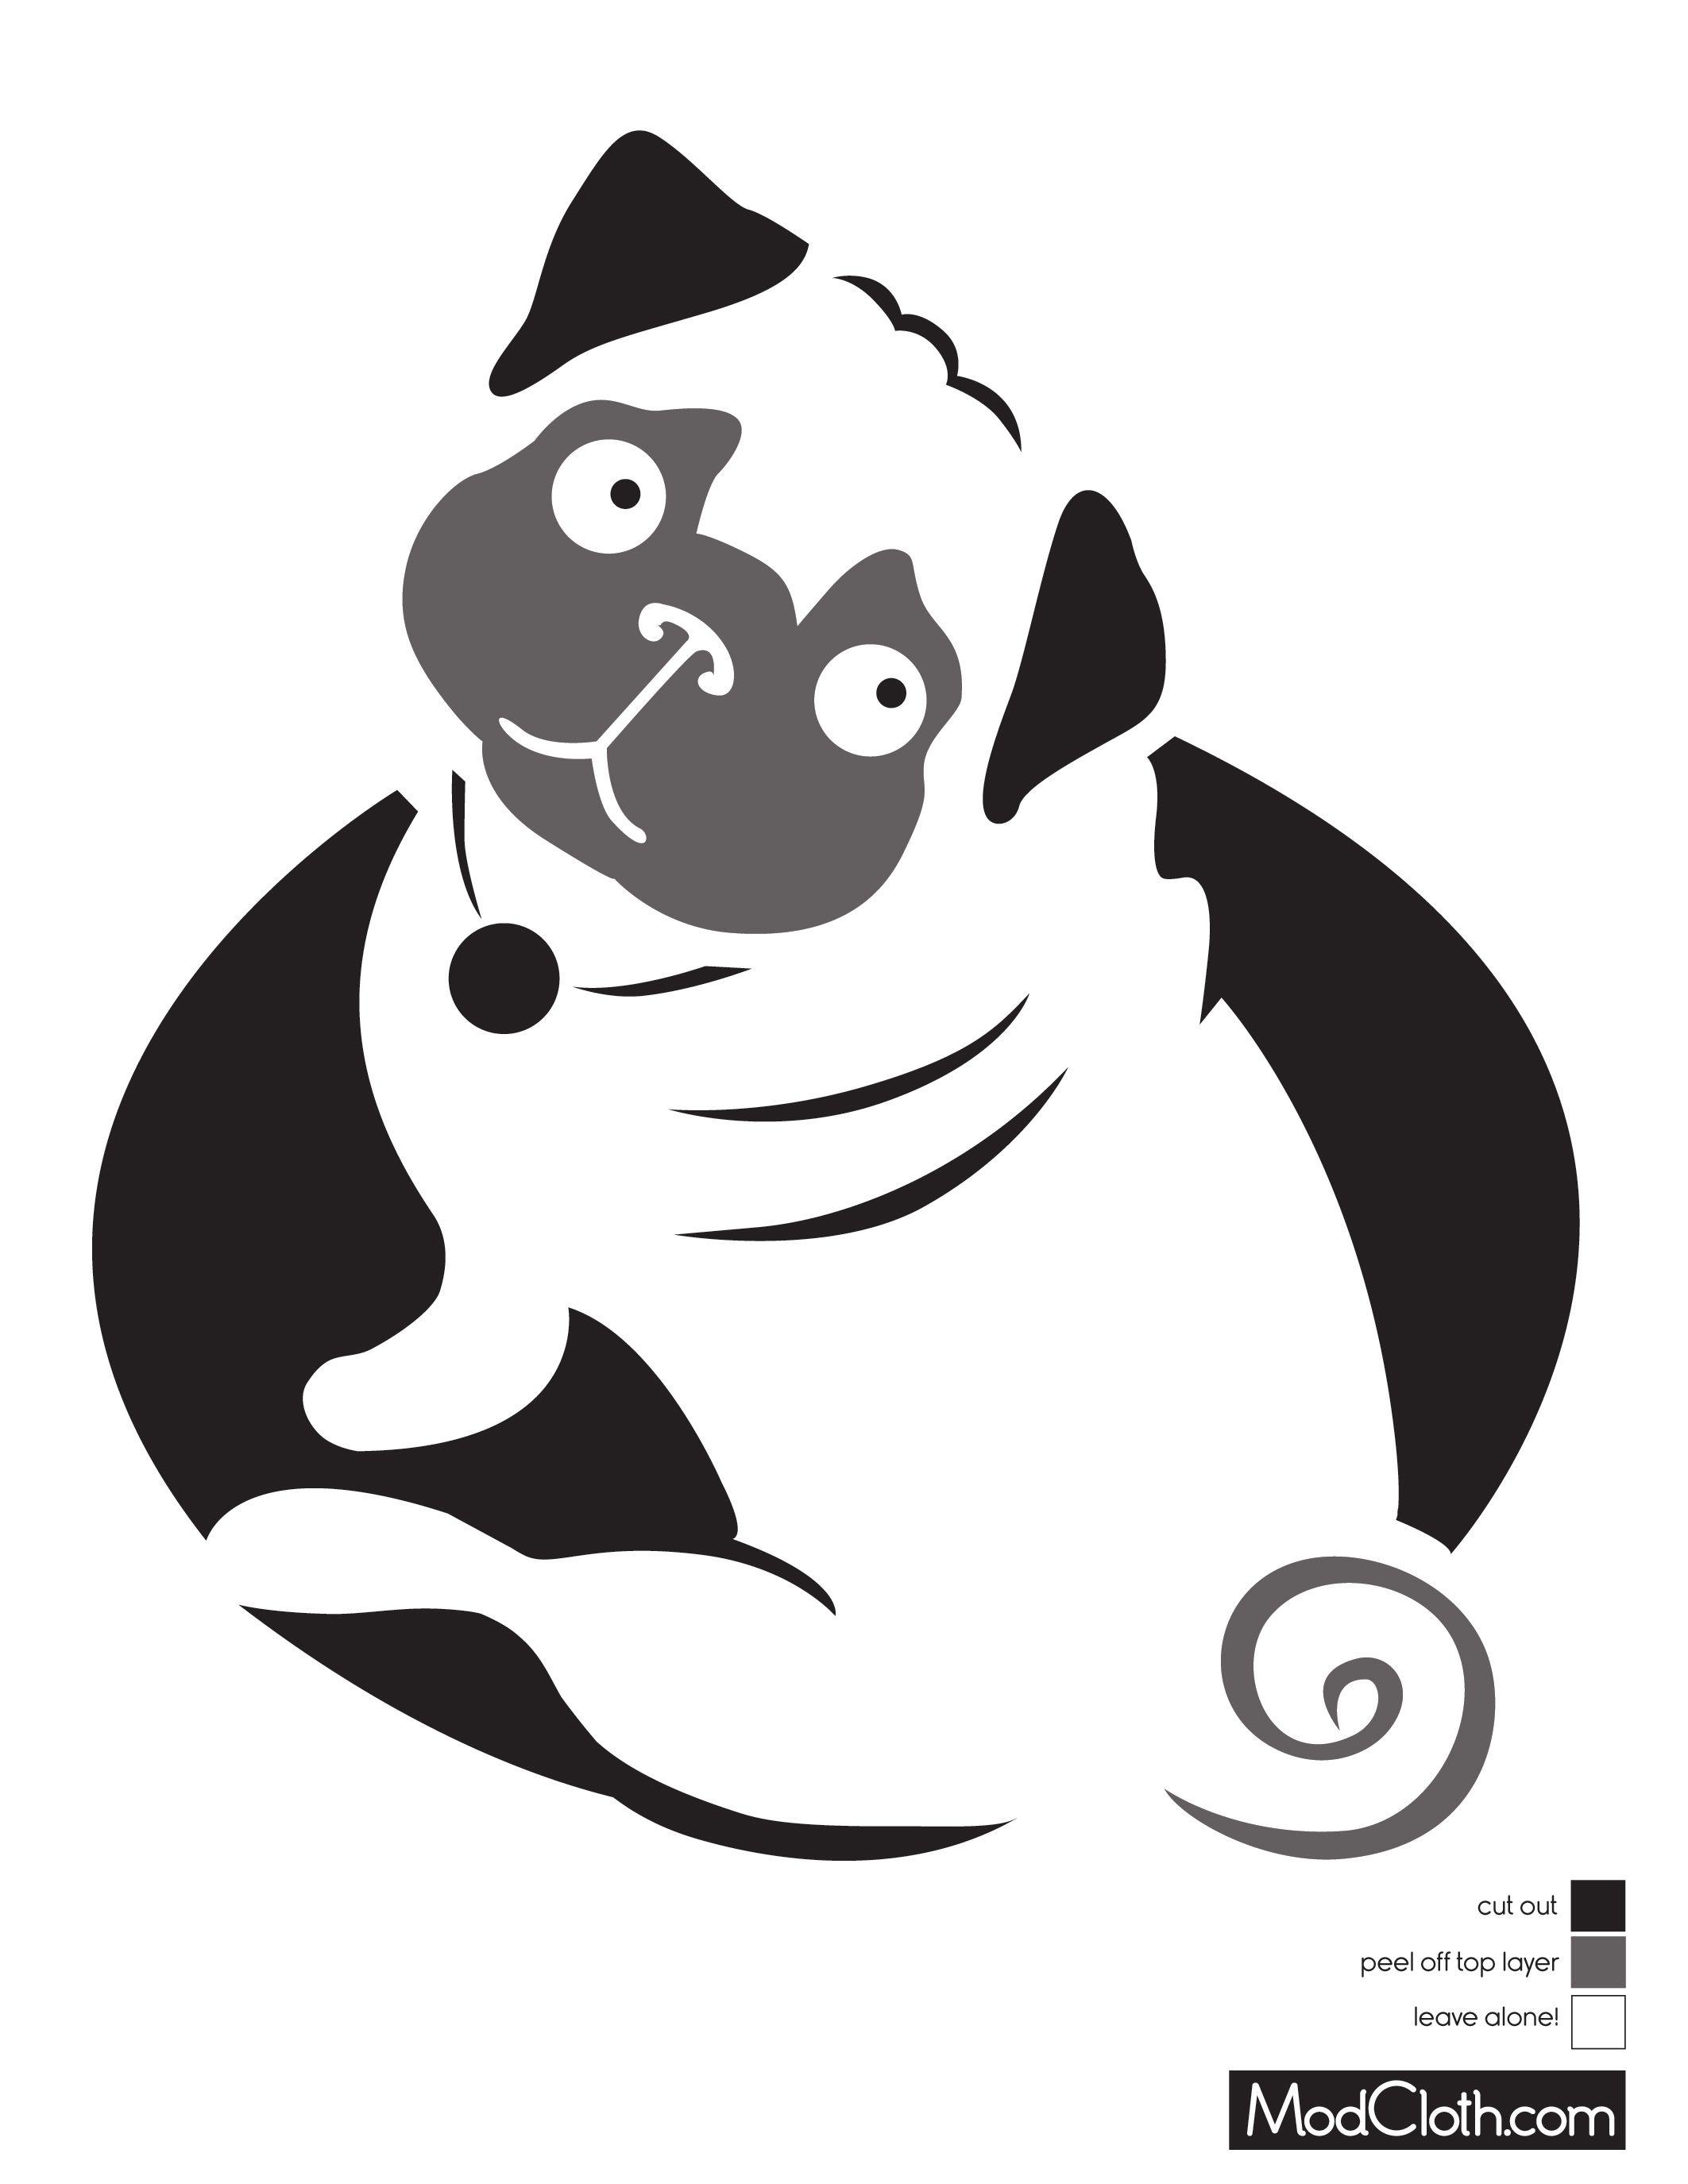 Pug Dog Silhouette Free Halloween Pumpkin Carving Stencil Design